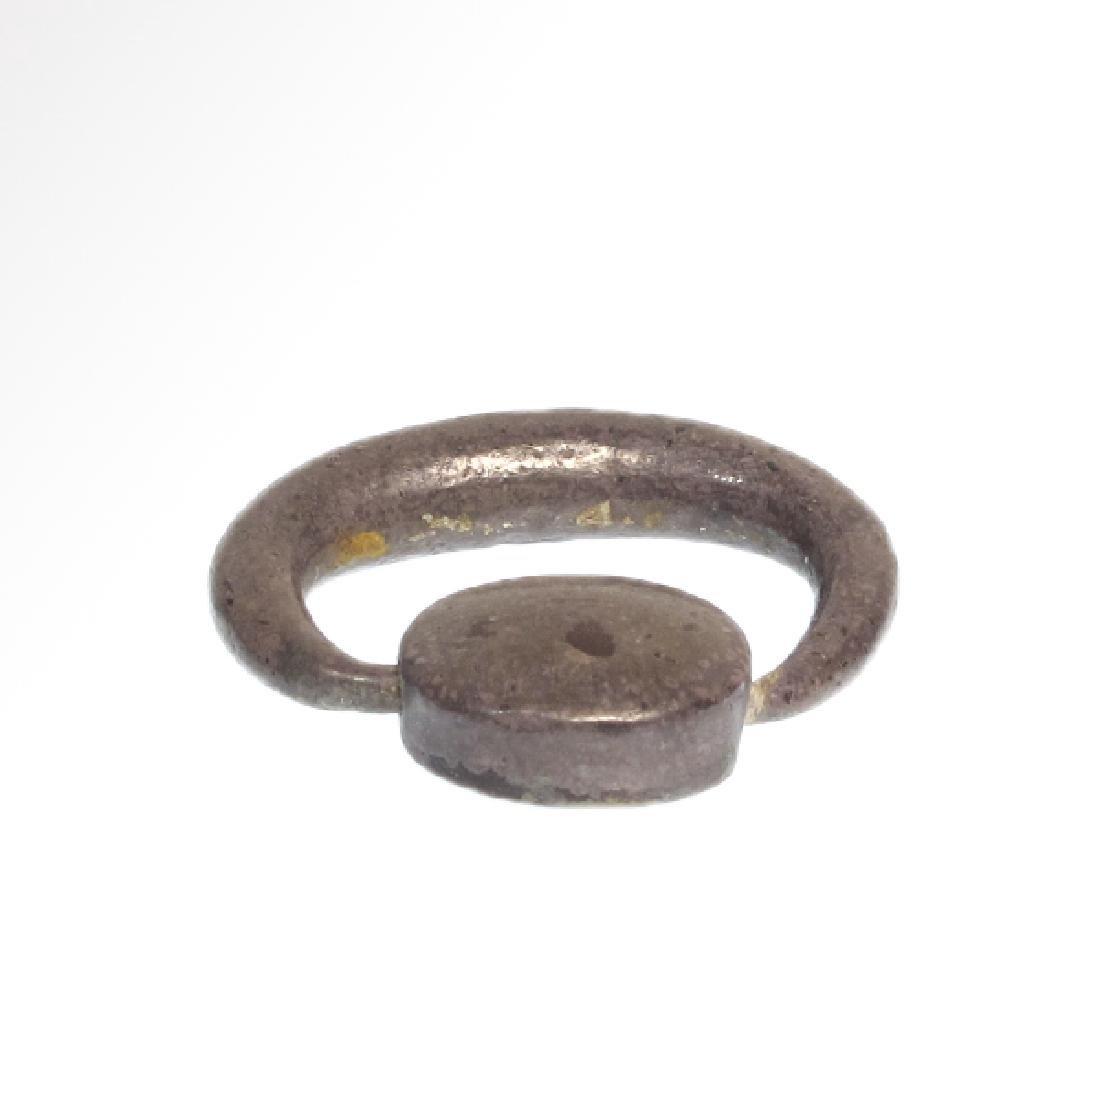 Egypto Phoenician Silver Swivel Ring, c. 1000 B.C. - 2